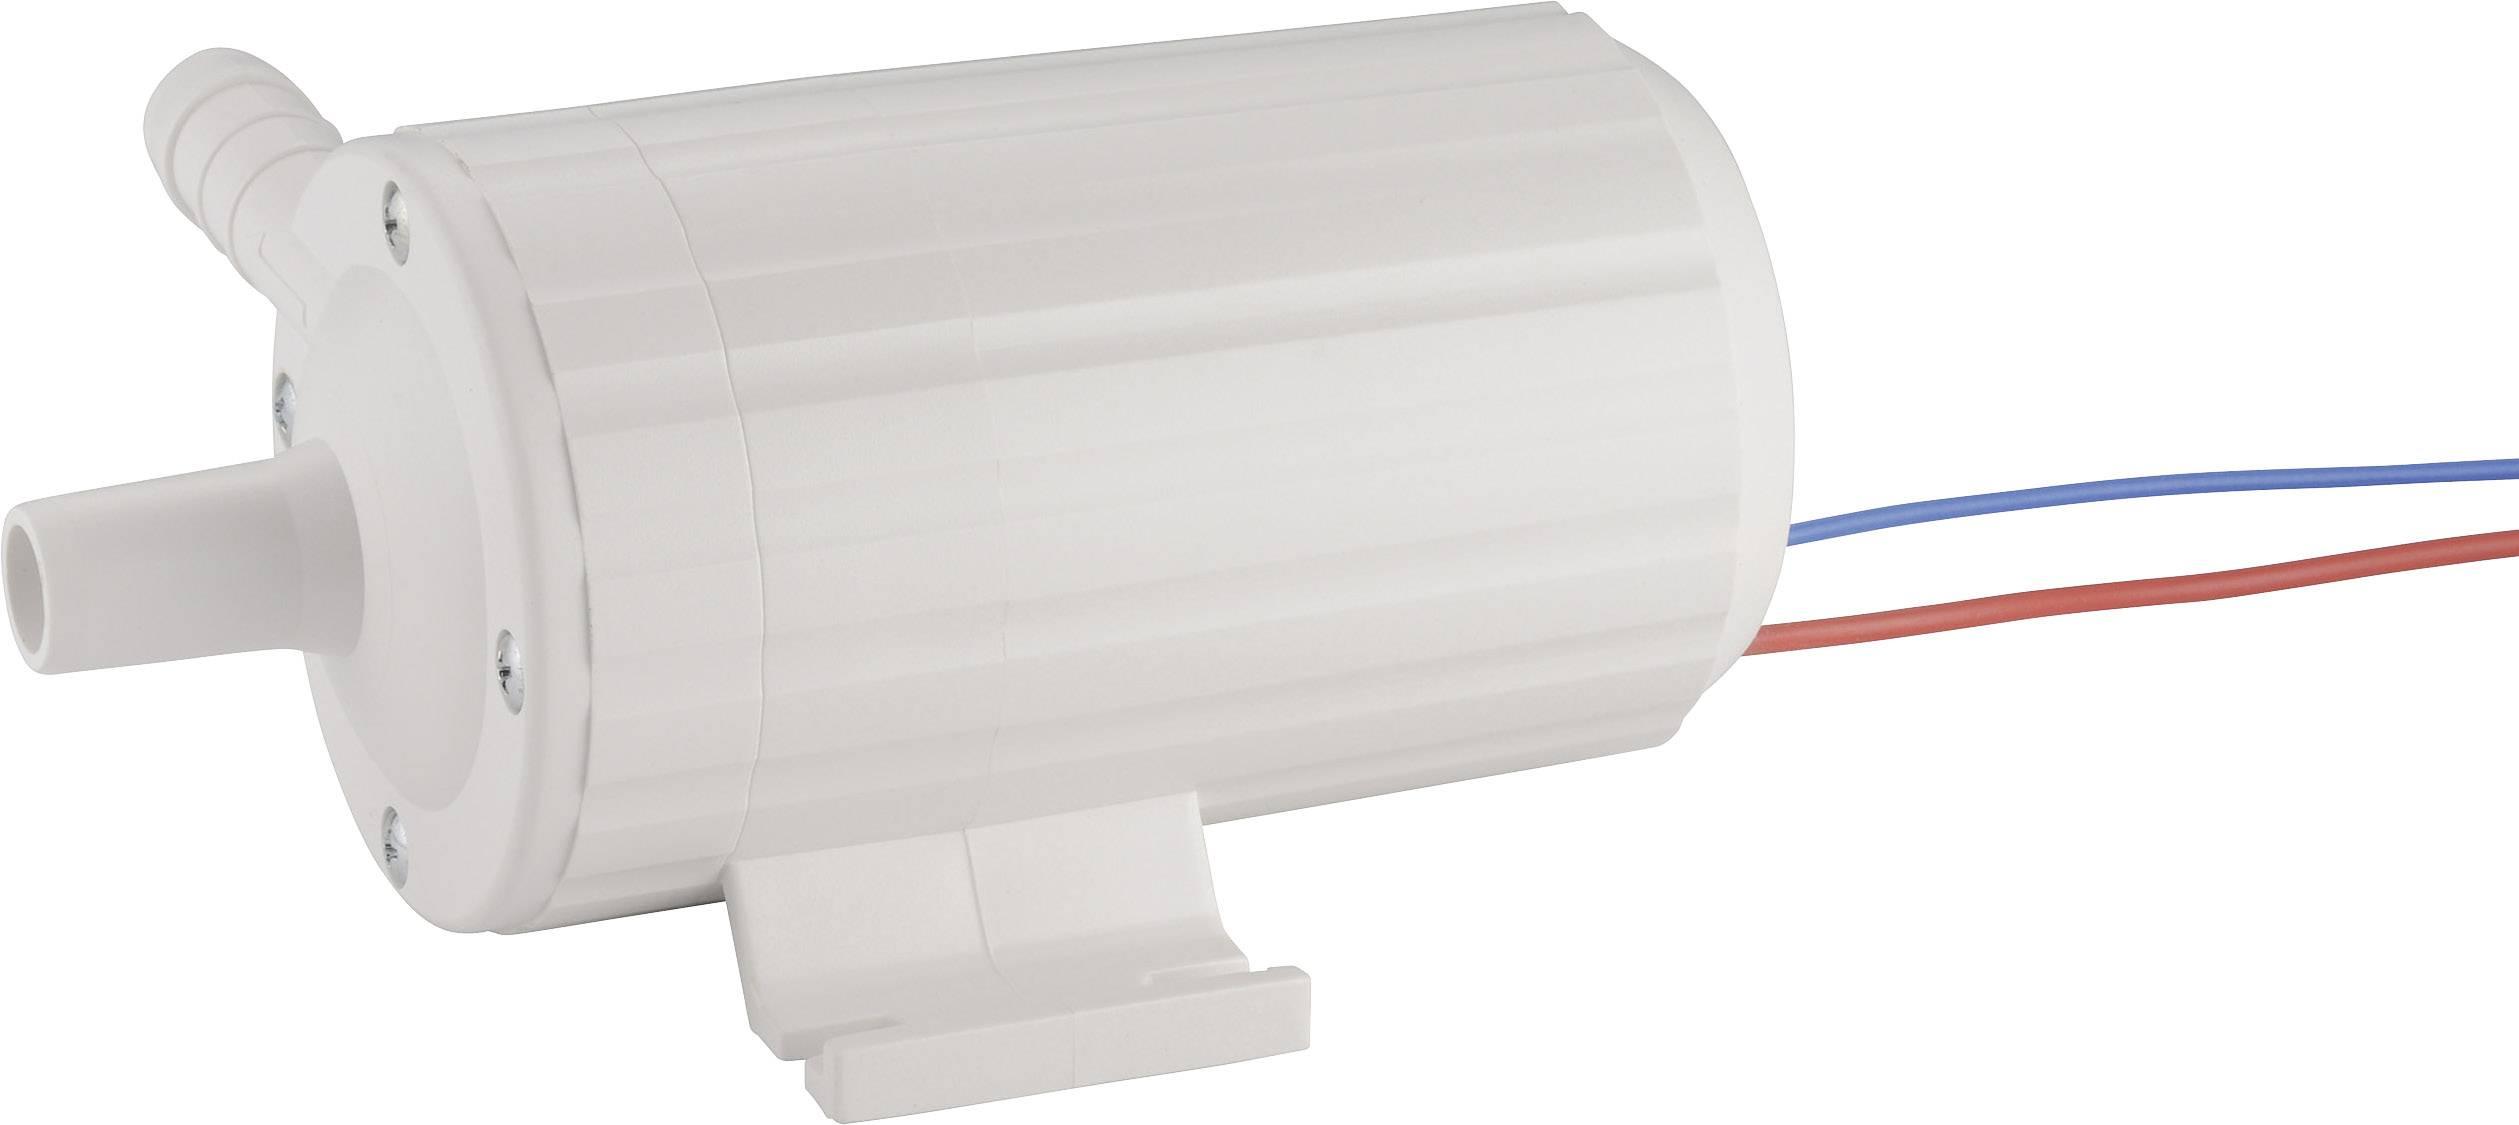 Nízkonapäťové prietokové čerpadlo Barwig 02, 1200 l/h, 12 V